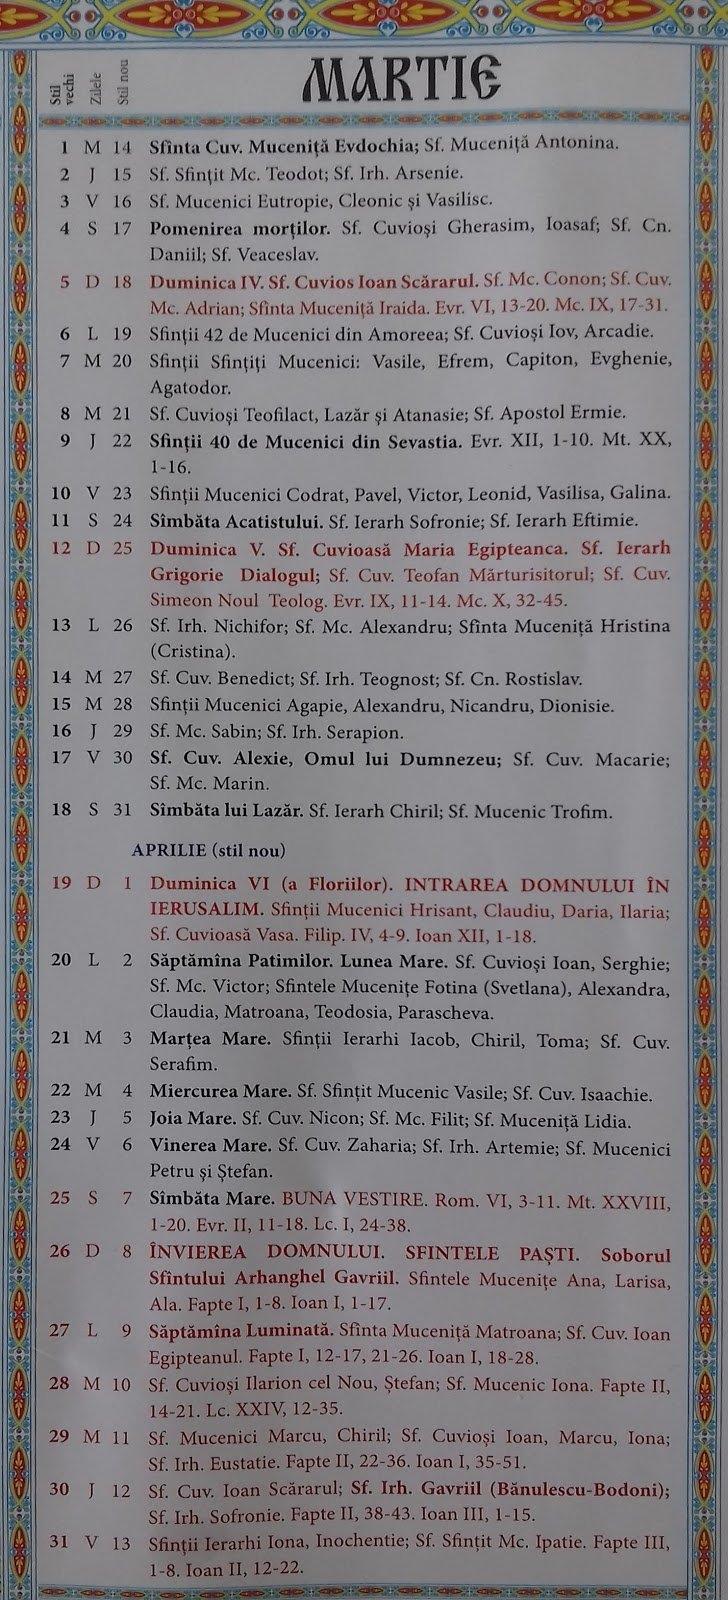 Calendar Crestin Ortodox 2018 2019 Stil Vechi Republica Moldova 8 Iunie 2019 Calendar Ortodox